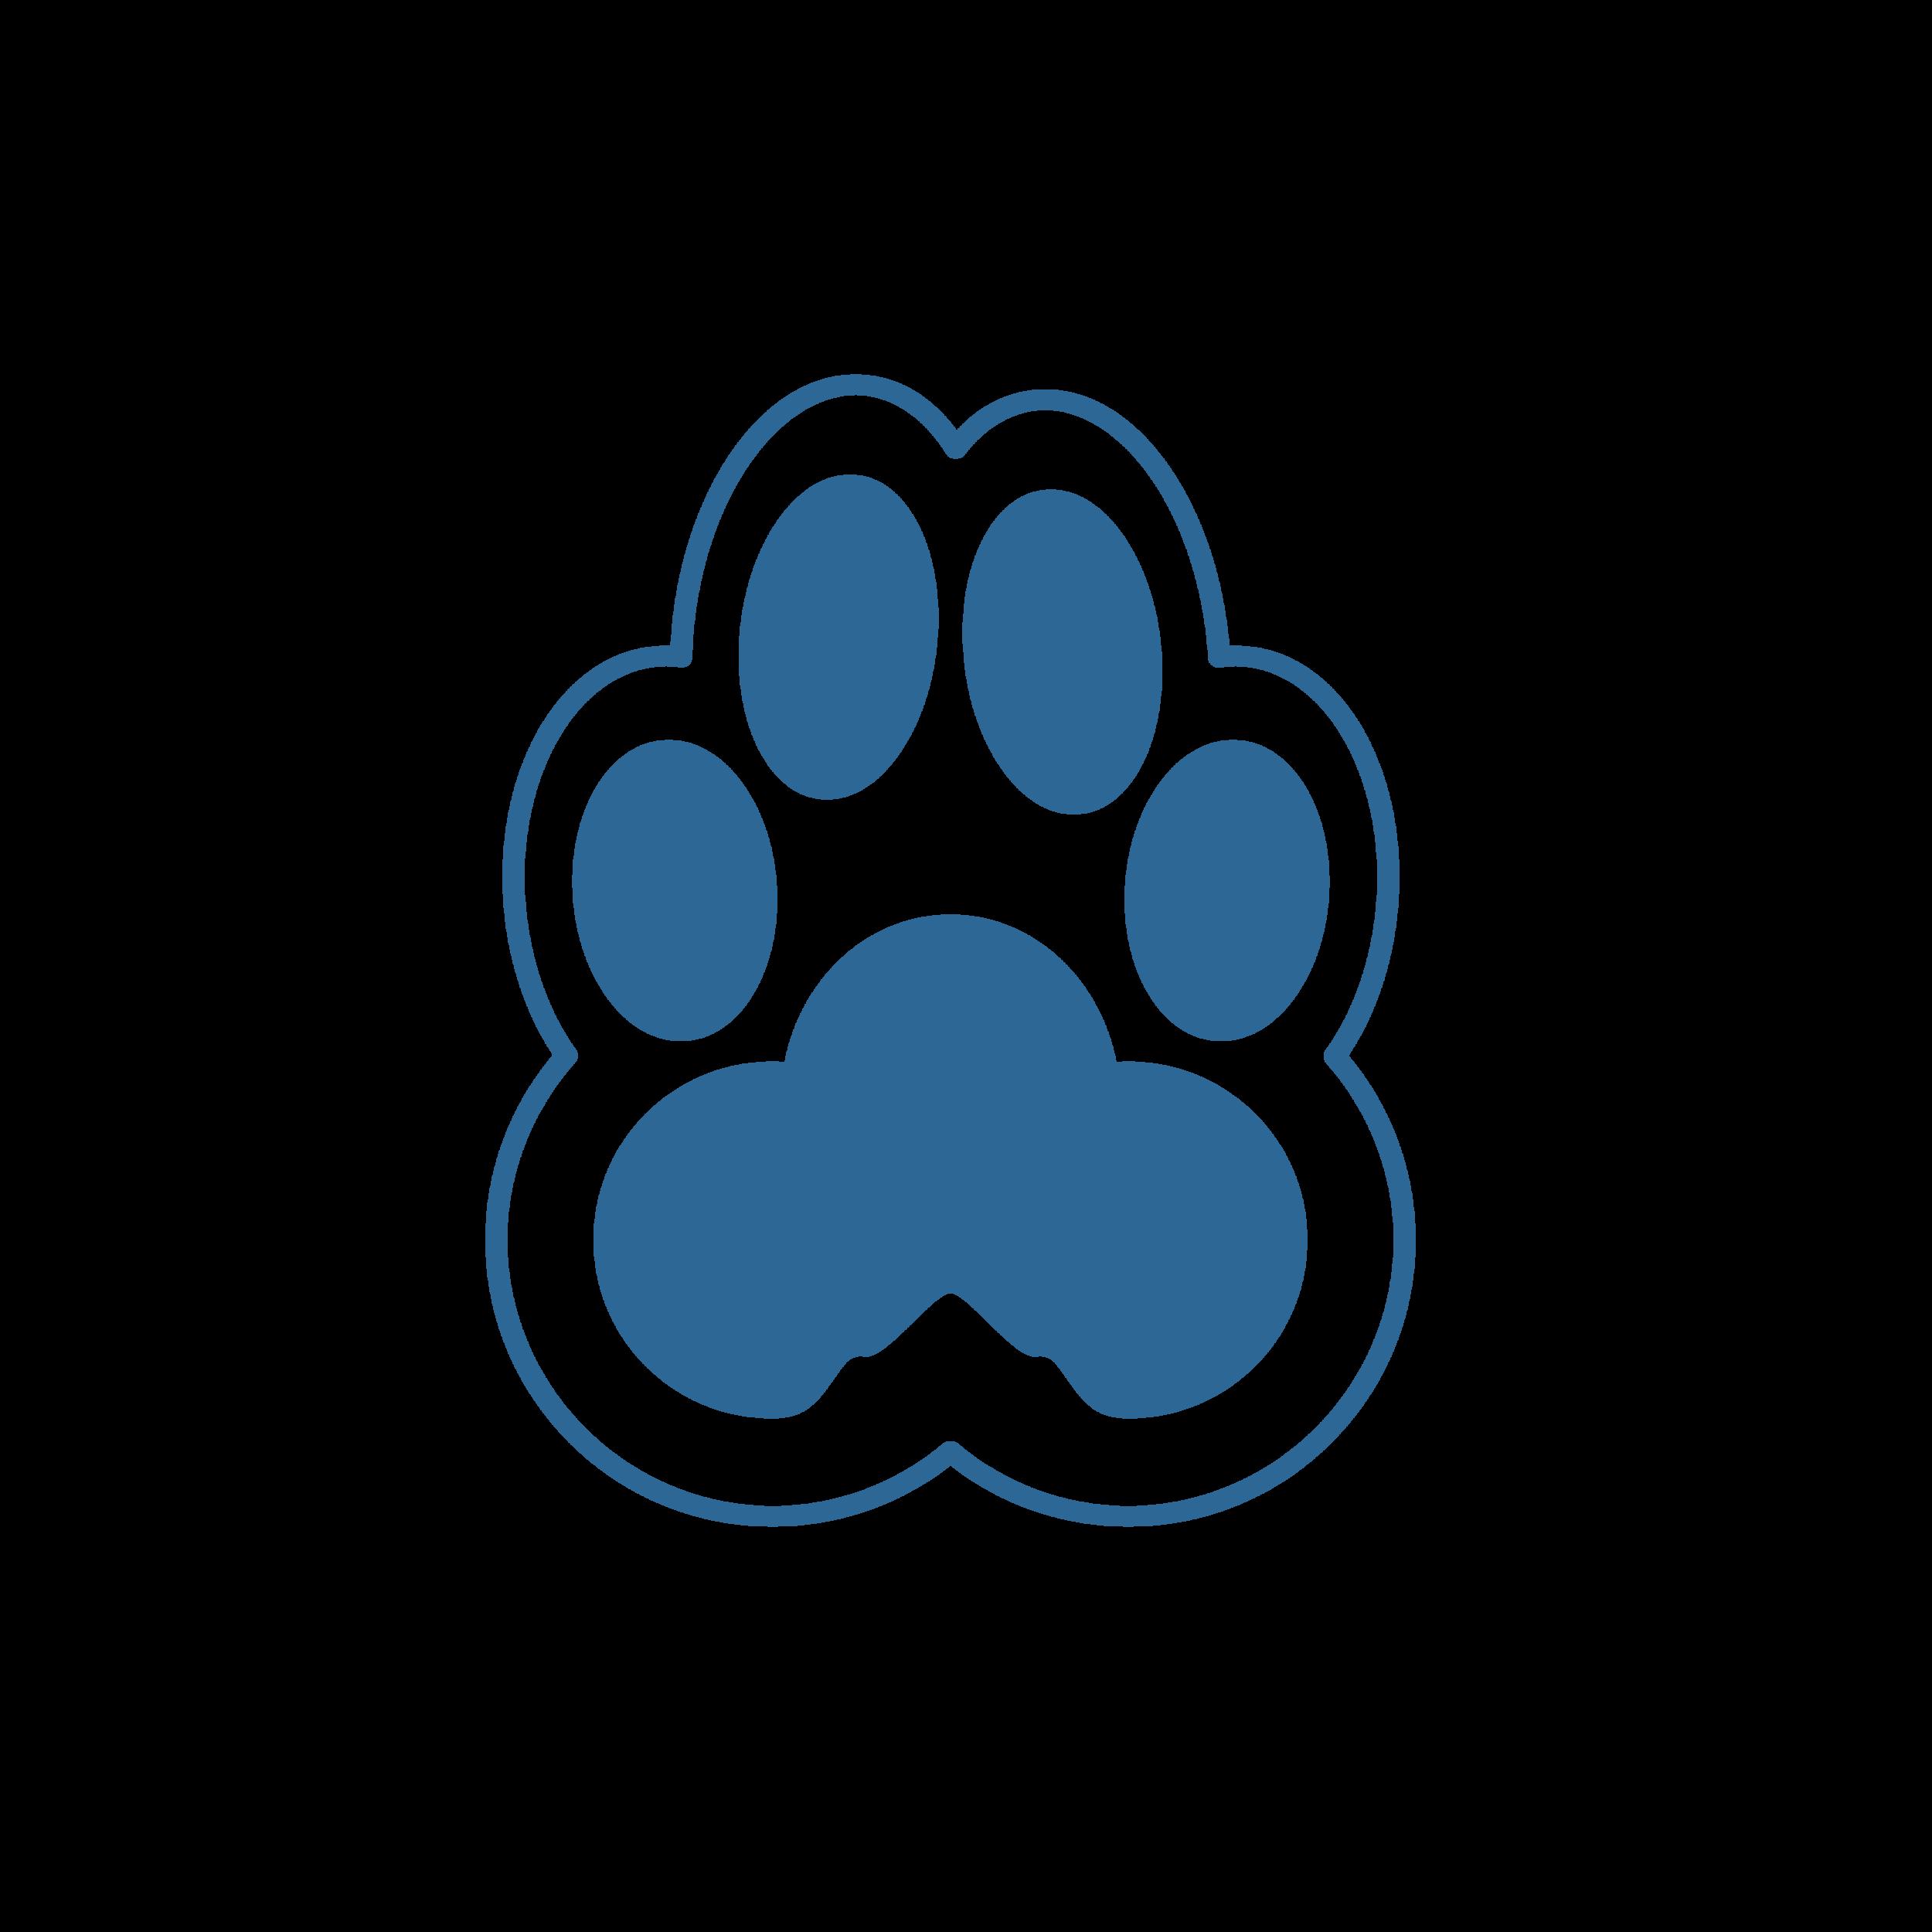 The Logo crest.